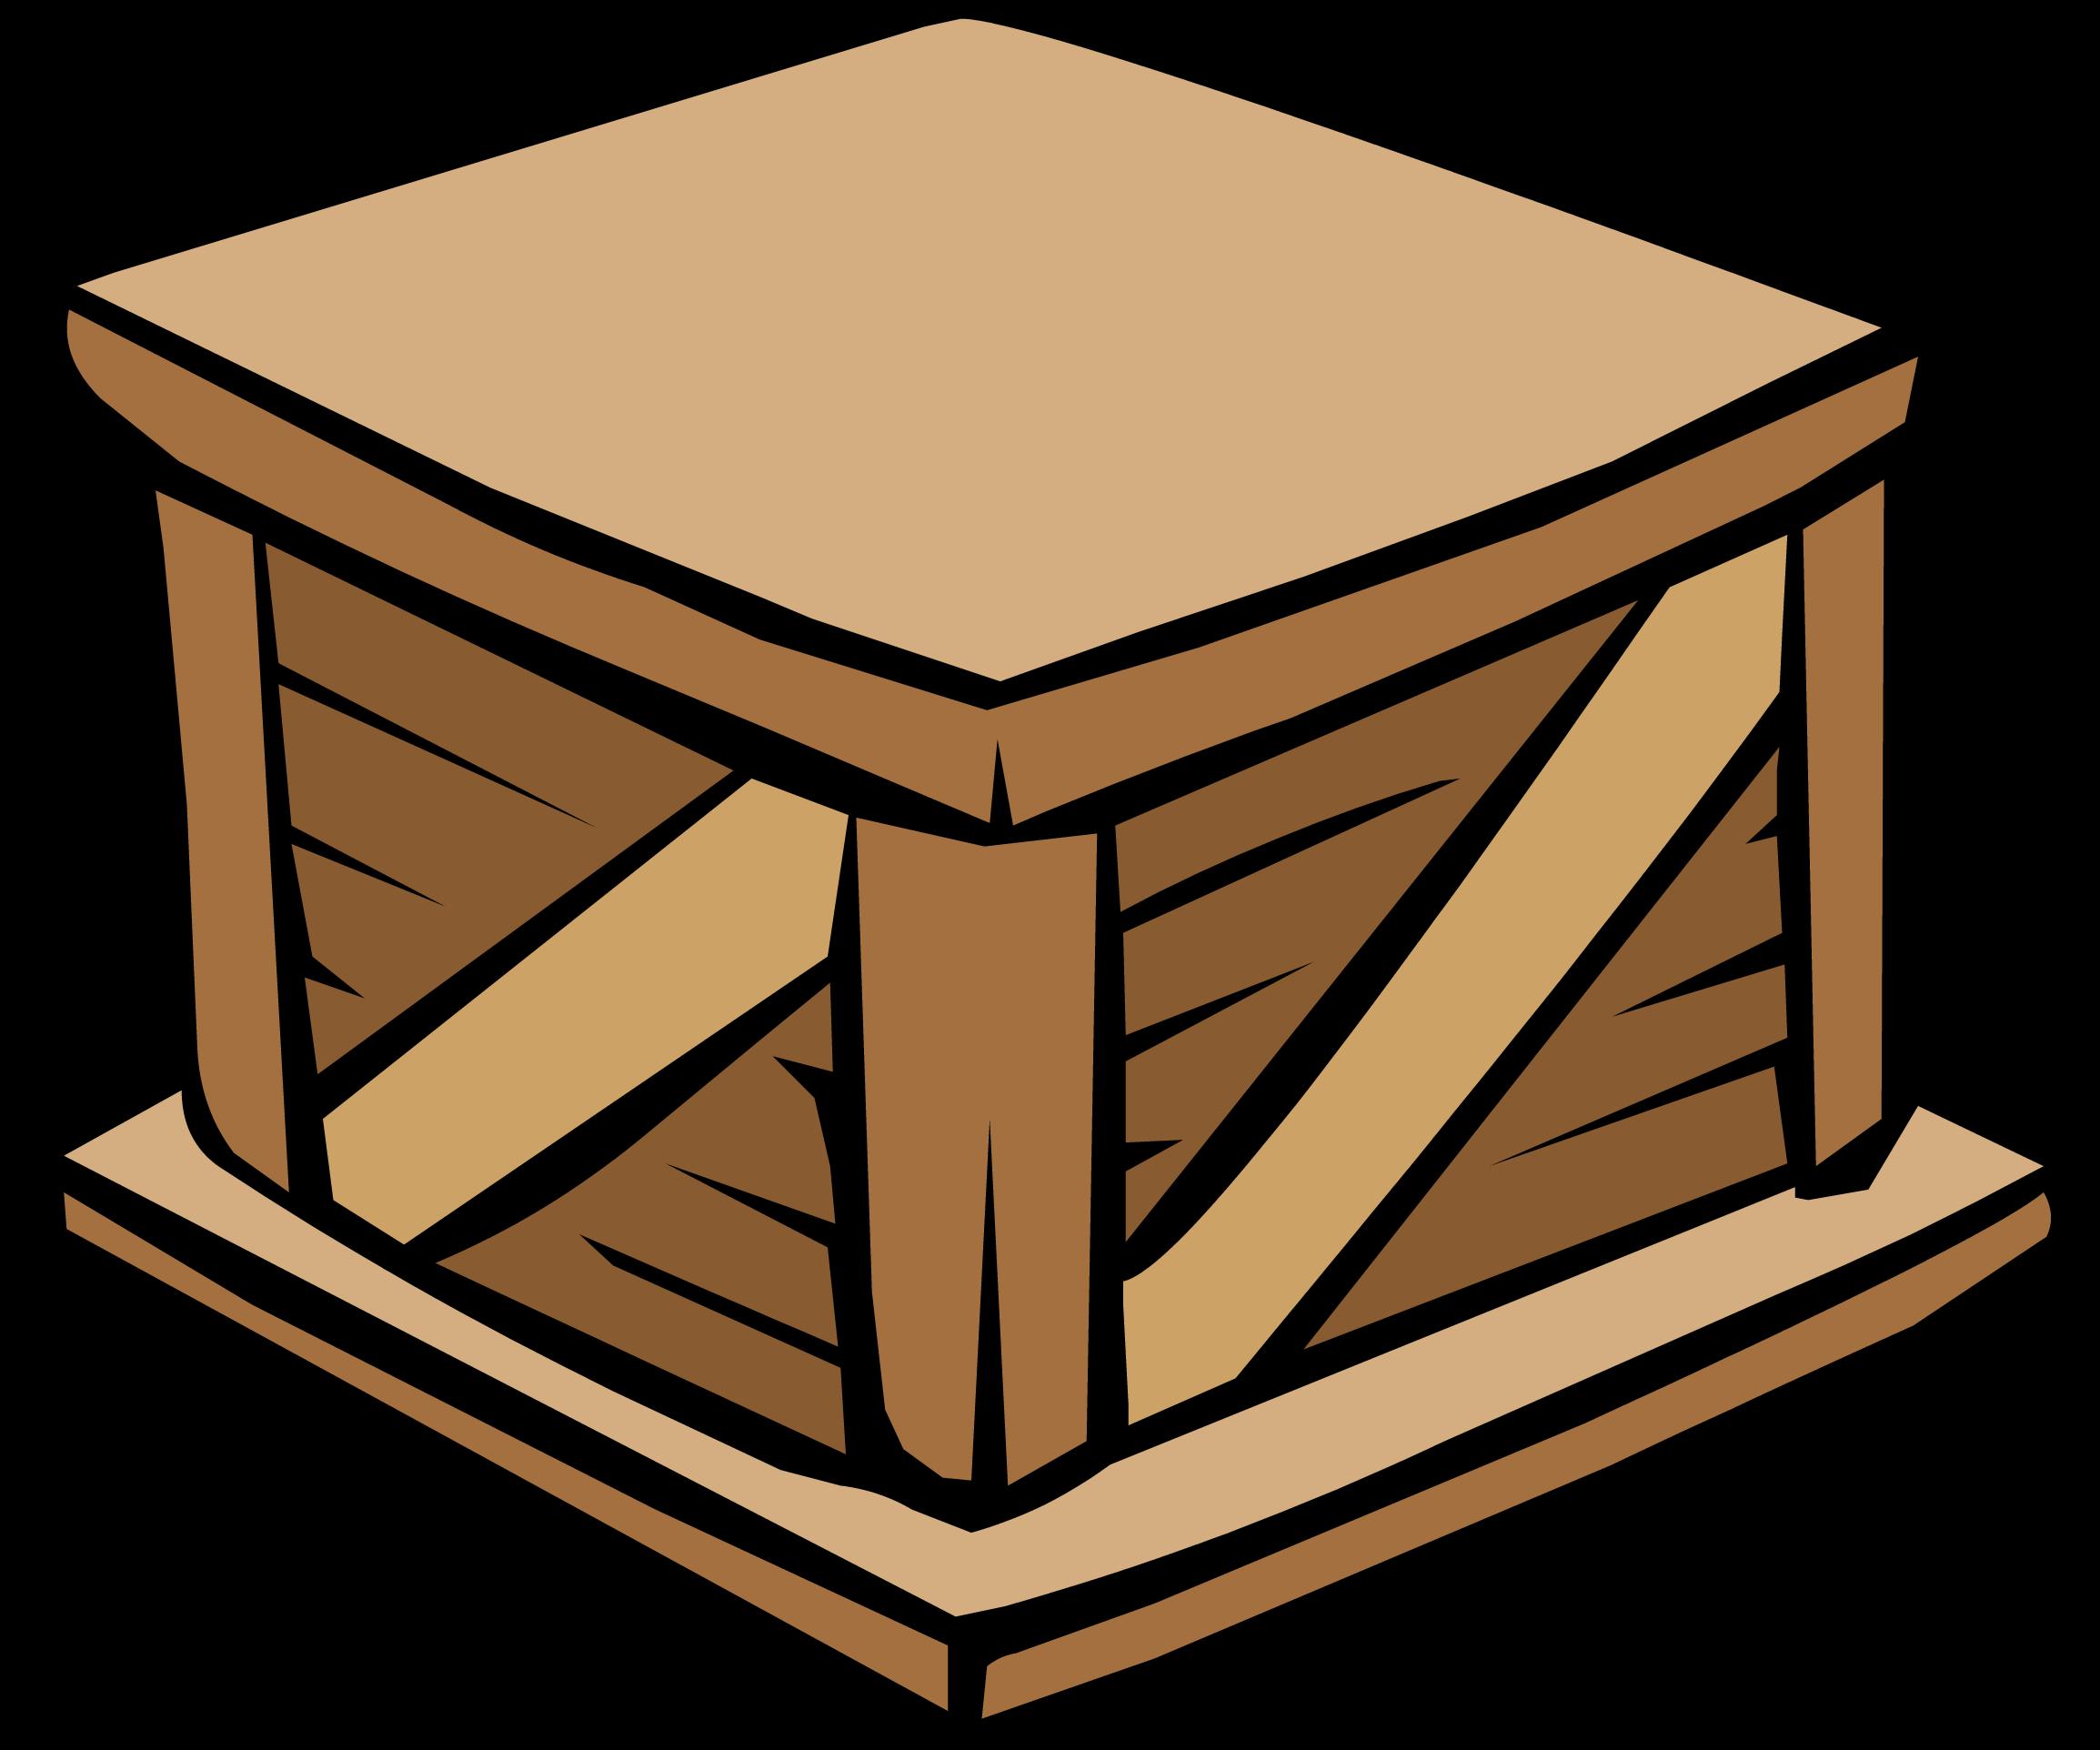 Crime clipart reprehensible. Image wooden crate sprite